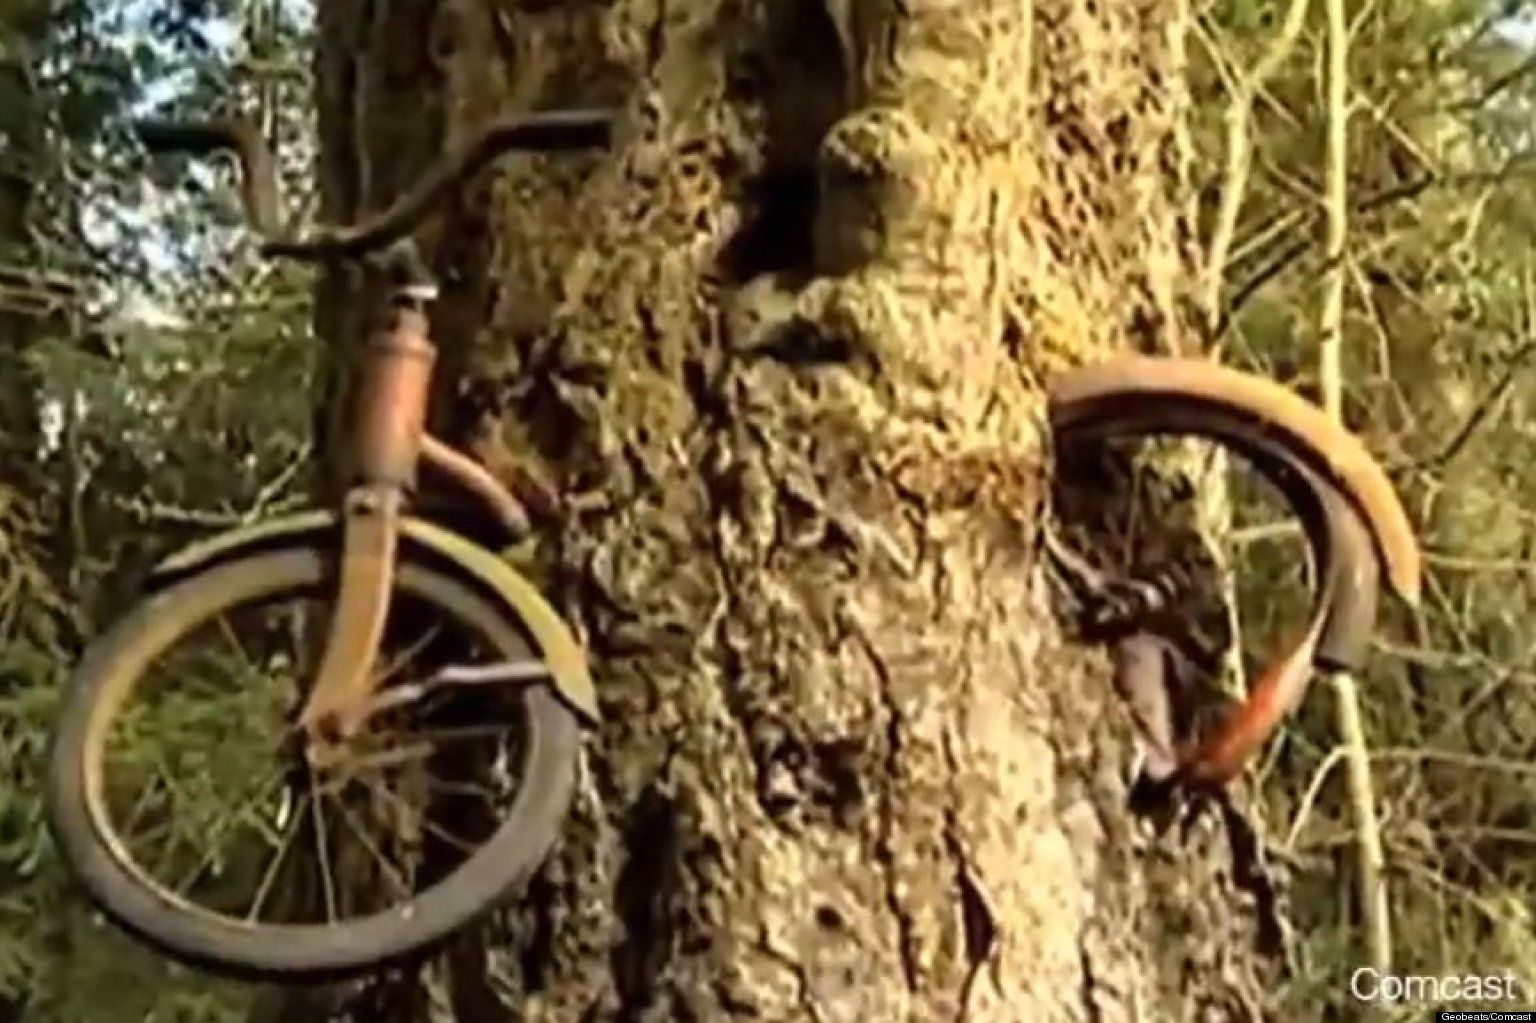 Look Bike Lost 50 Years Ago Swallowed By Tree Tree Story